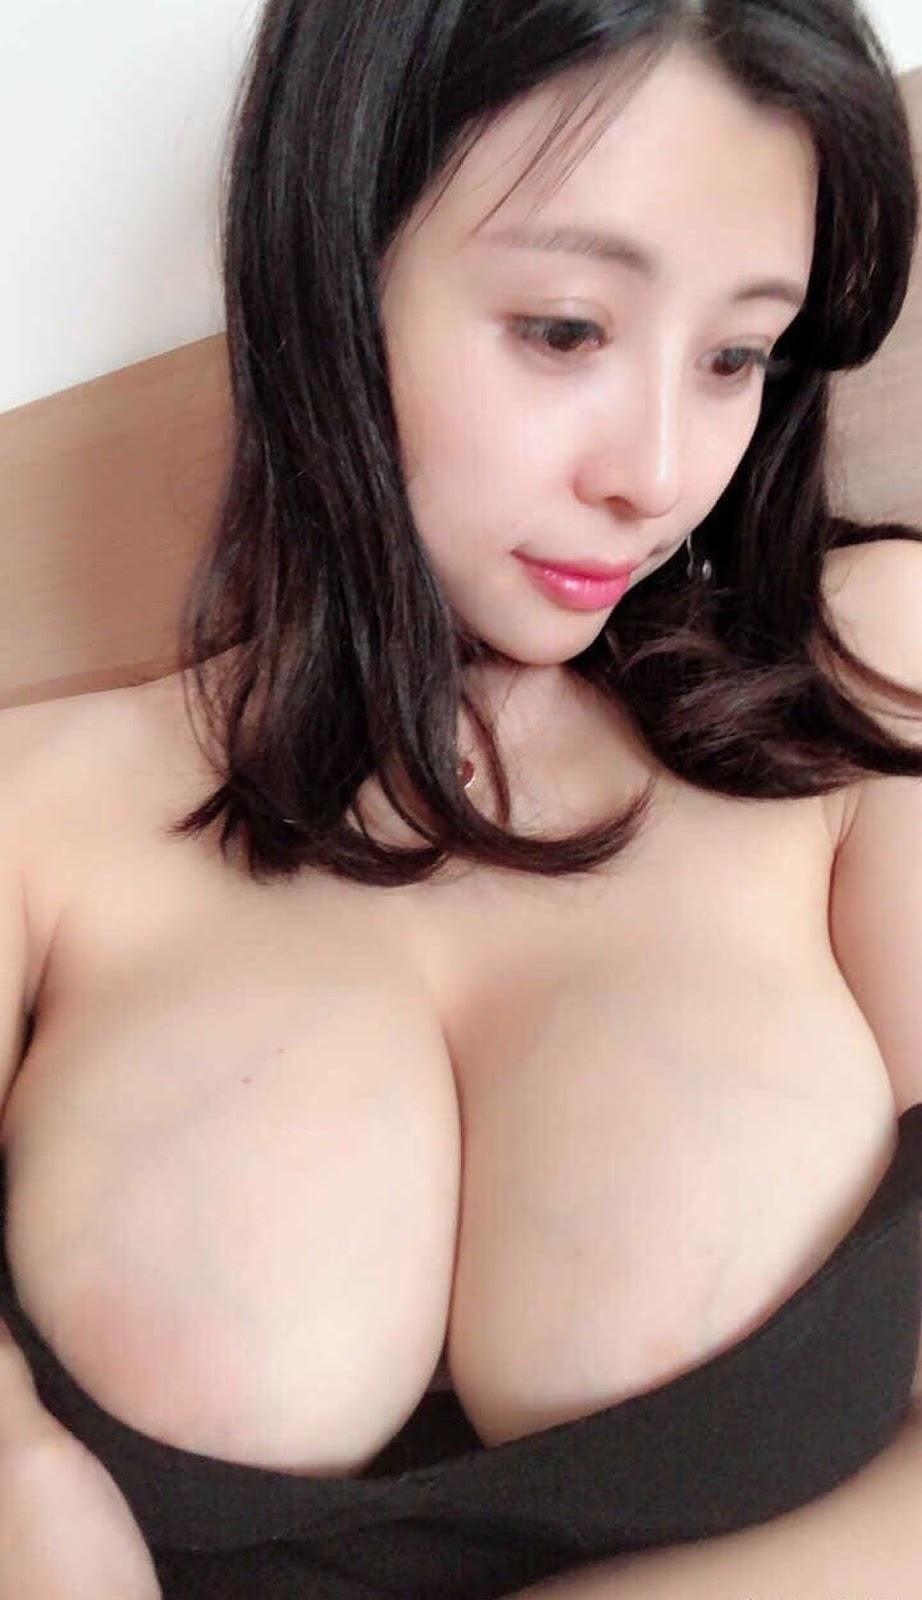 aHR0cHM6Ly93d3cubXlteXBpYy5uZXQvZGF0YS9hdHRhY2htZW50L2ZvcnVtLzIwMTkwOC8yMC8wODM0MTd6ODNtOGlrazZtZXQ4dmg0LmpwZy50aHVtYi5qcGc%253D - 成都瓶儿 - Chengdu Pinger big tits selfie nude 2020